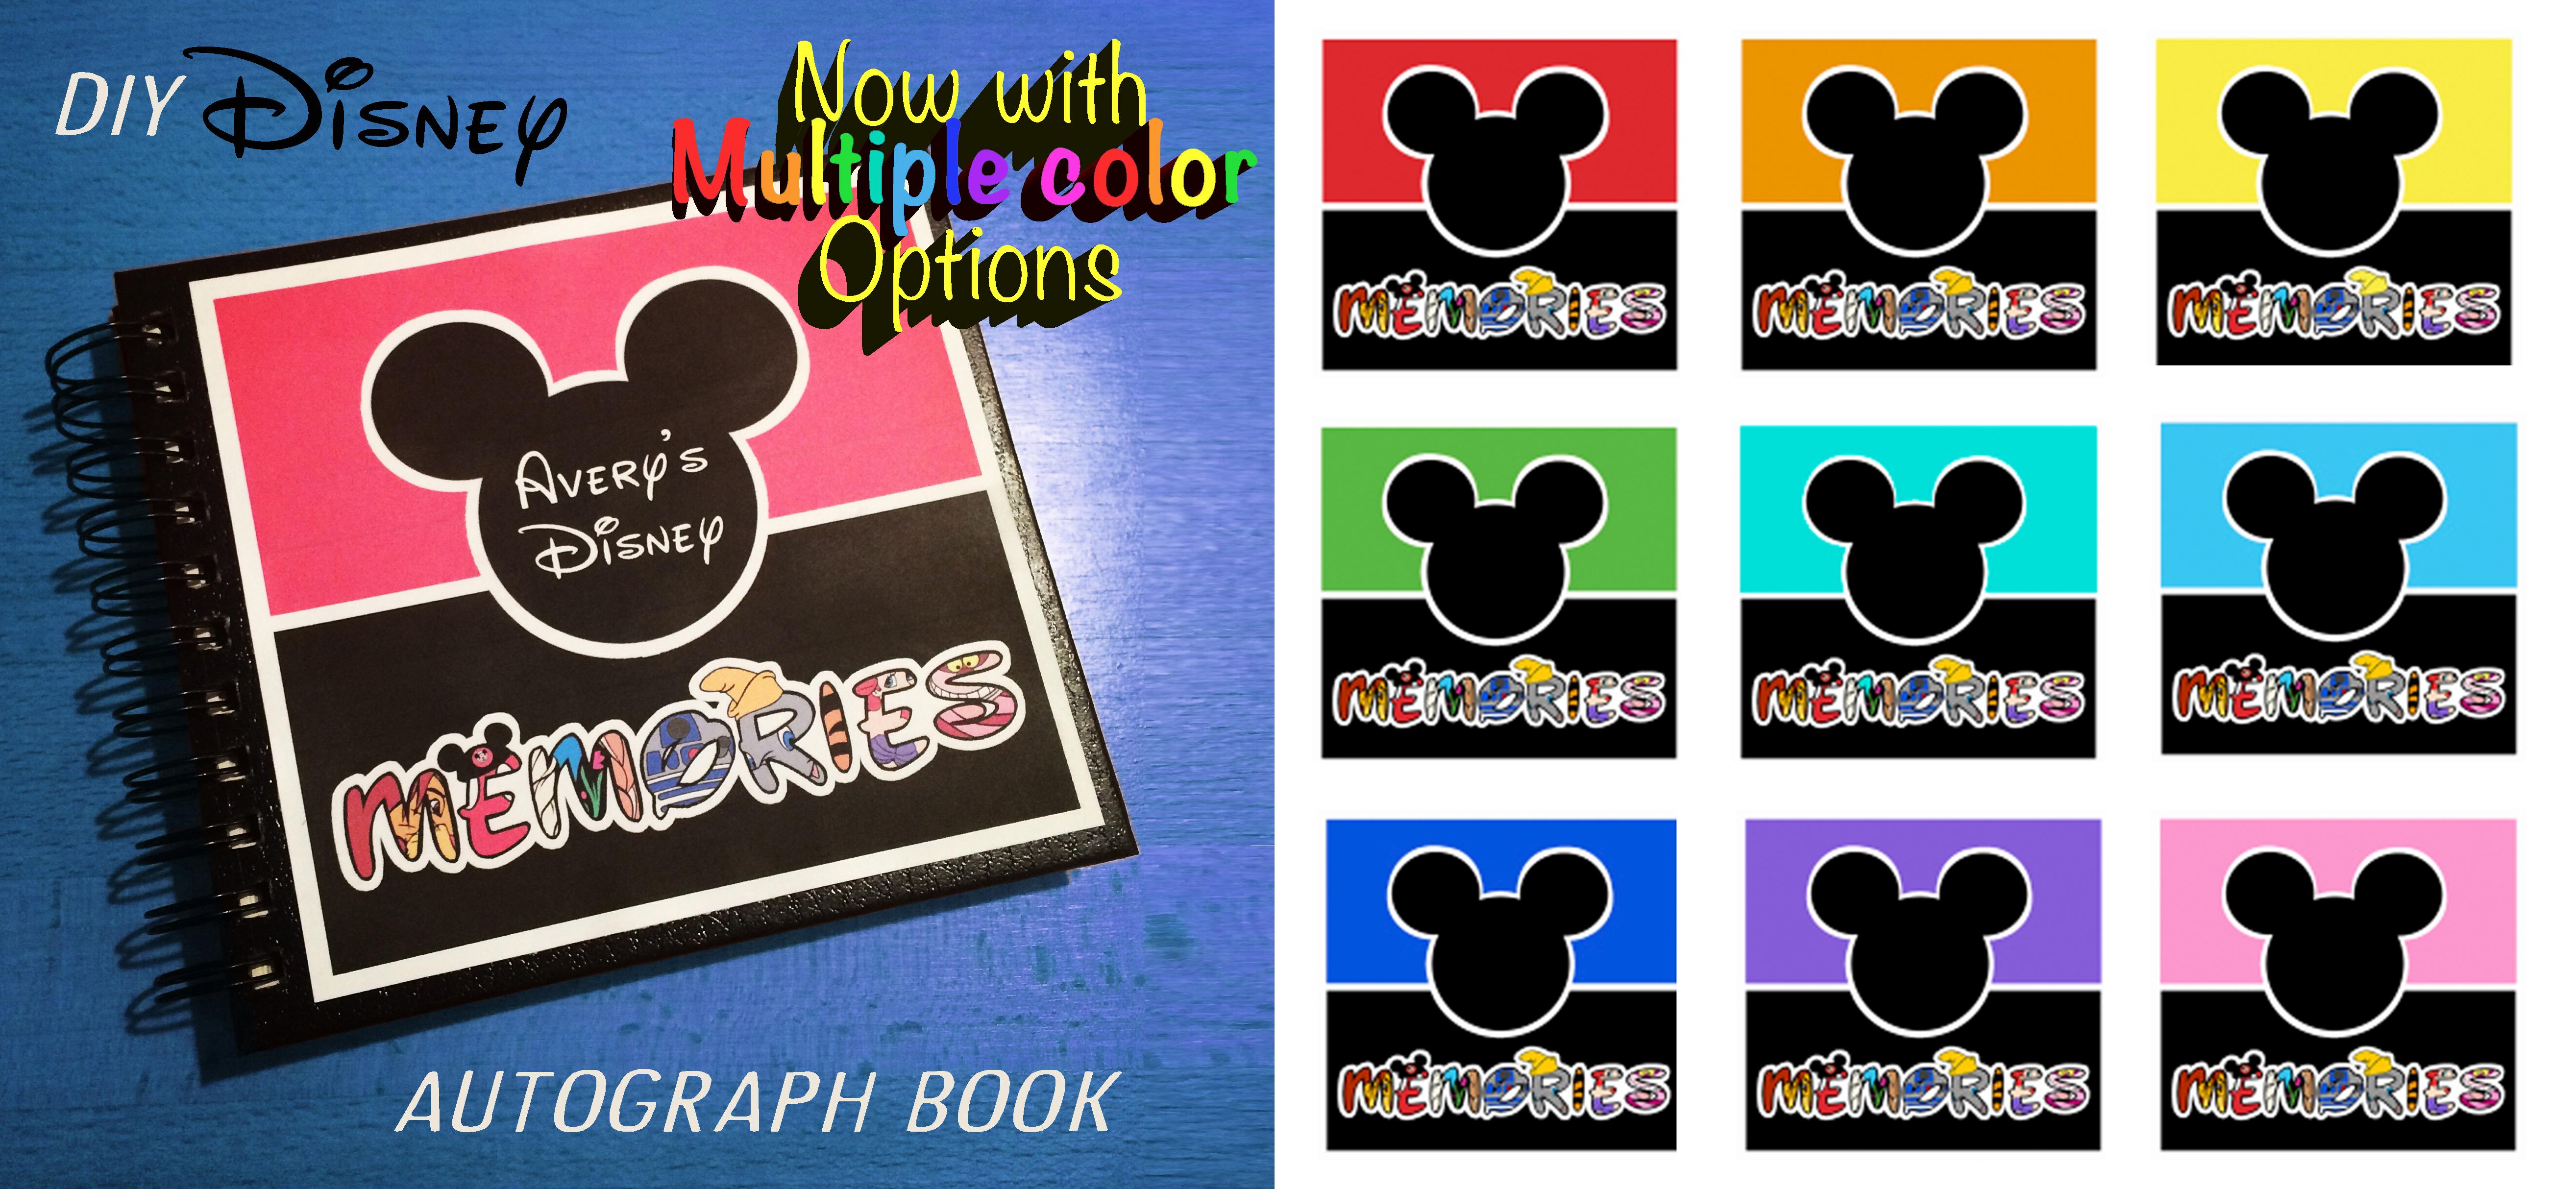 DIY Disney Autograph Memory Book - Multiple Colors Banner.jpg